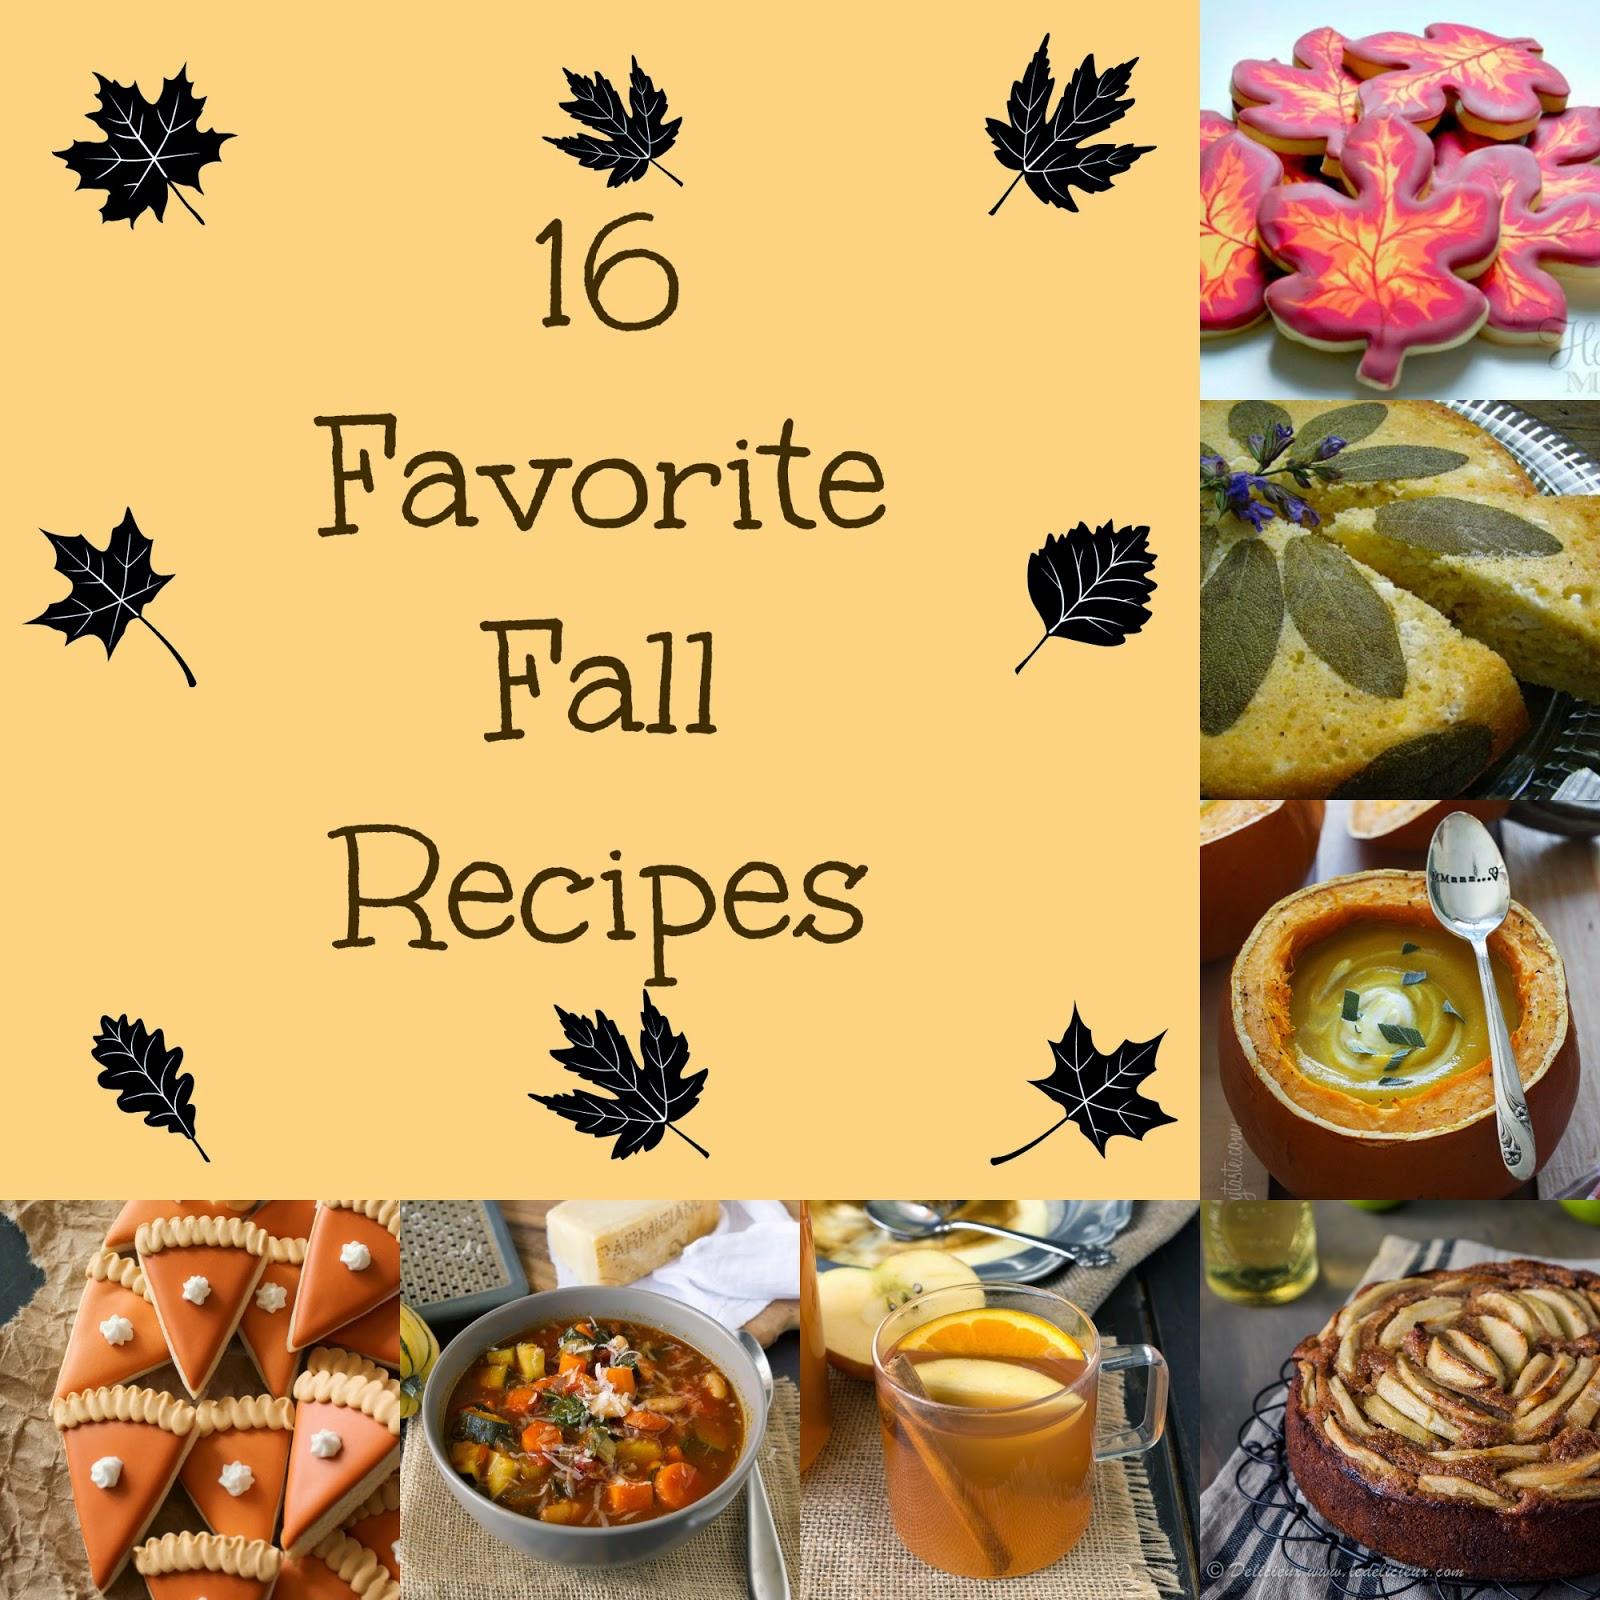 16 Favorite Fall Recipes